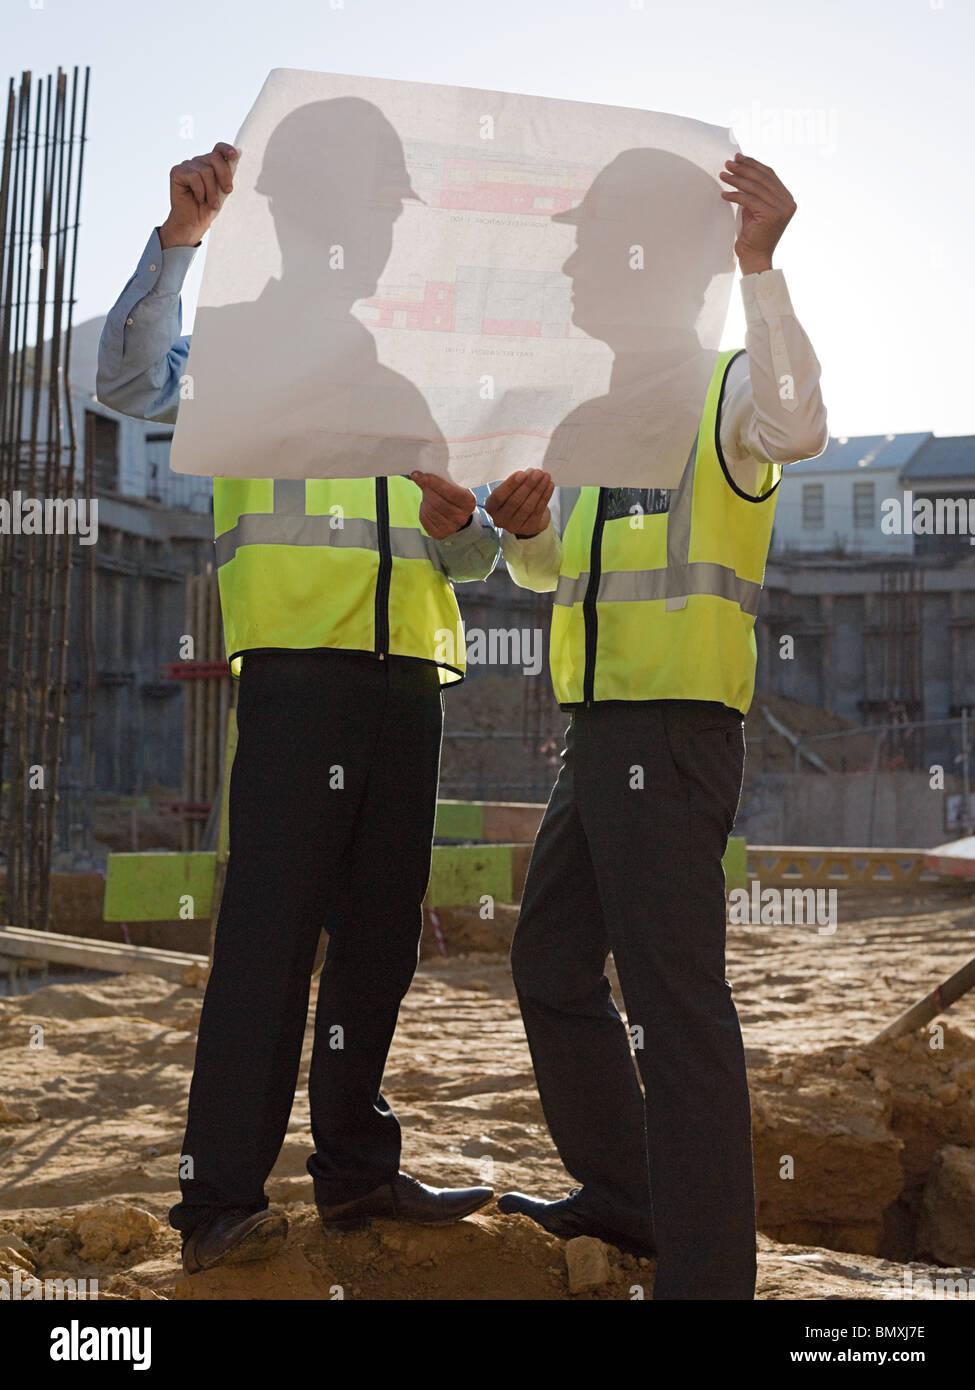 Reife Männer Inspektion Blaupausen auf Baustelle Stockbild